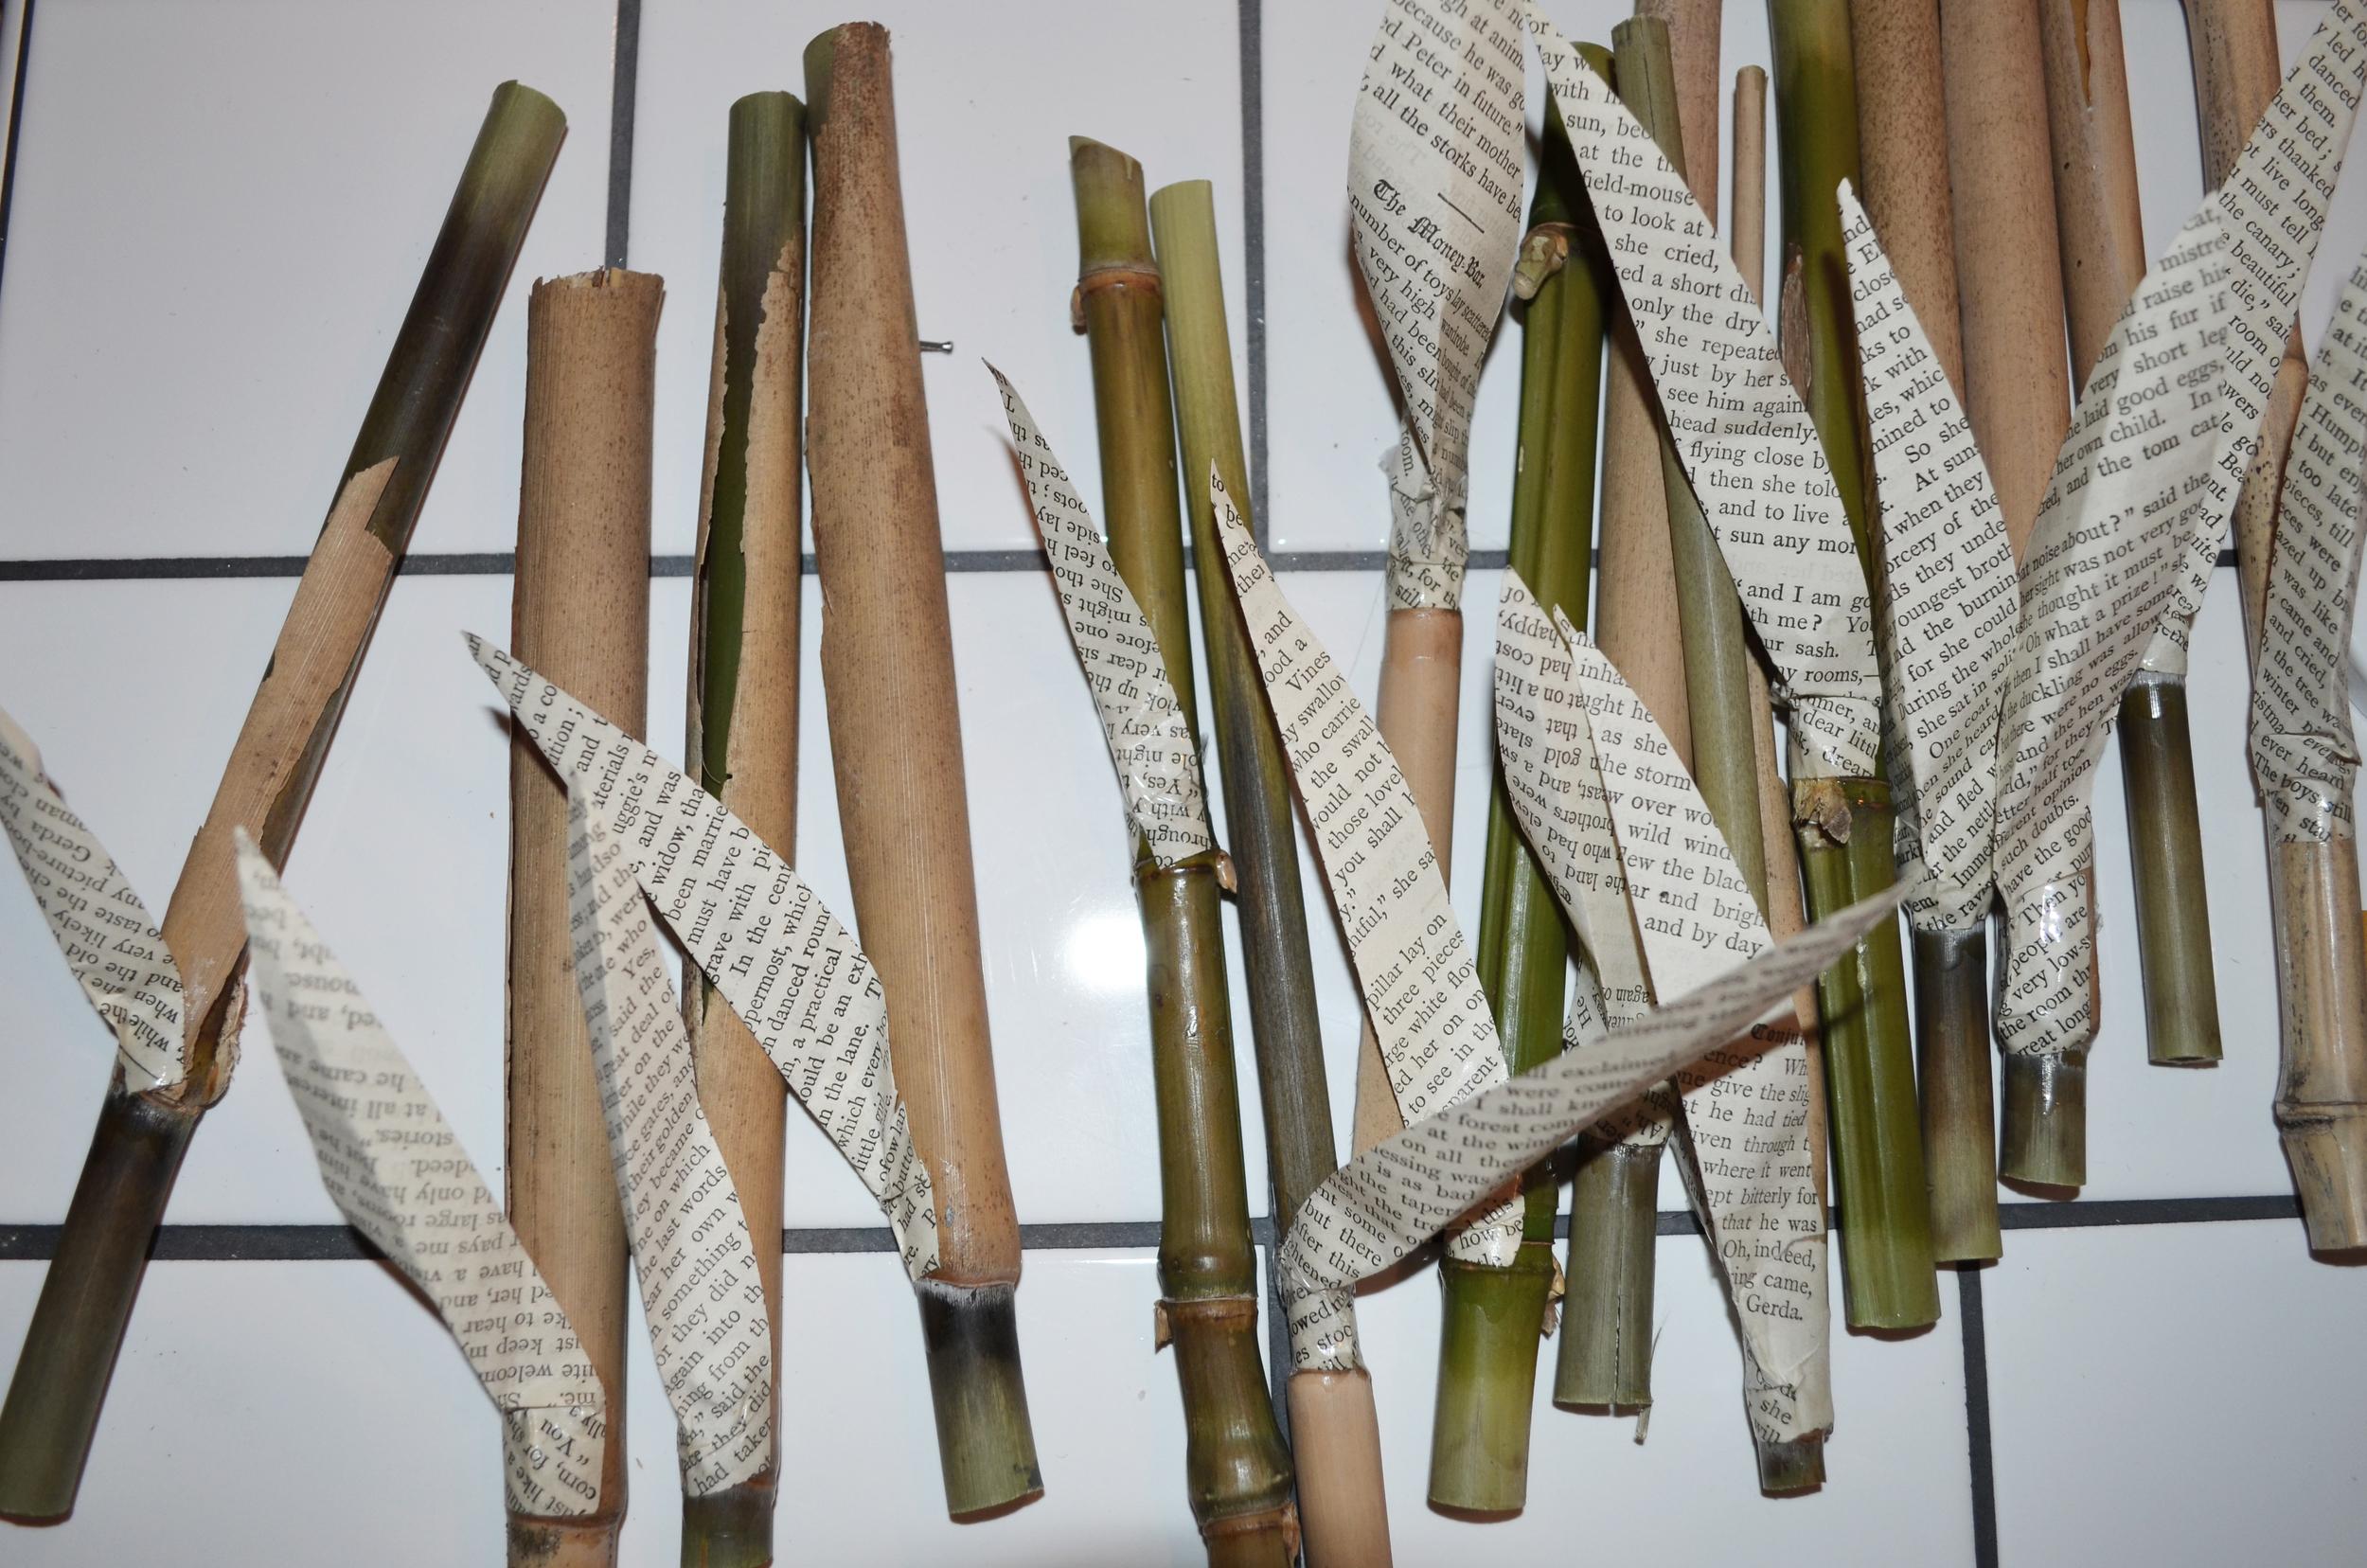 Wokit_Narratorium_Bamboo_Sticks